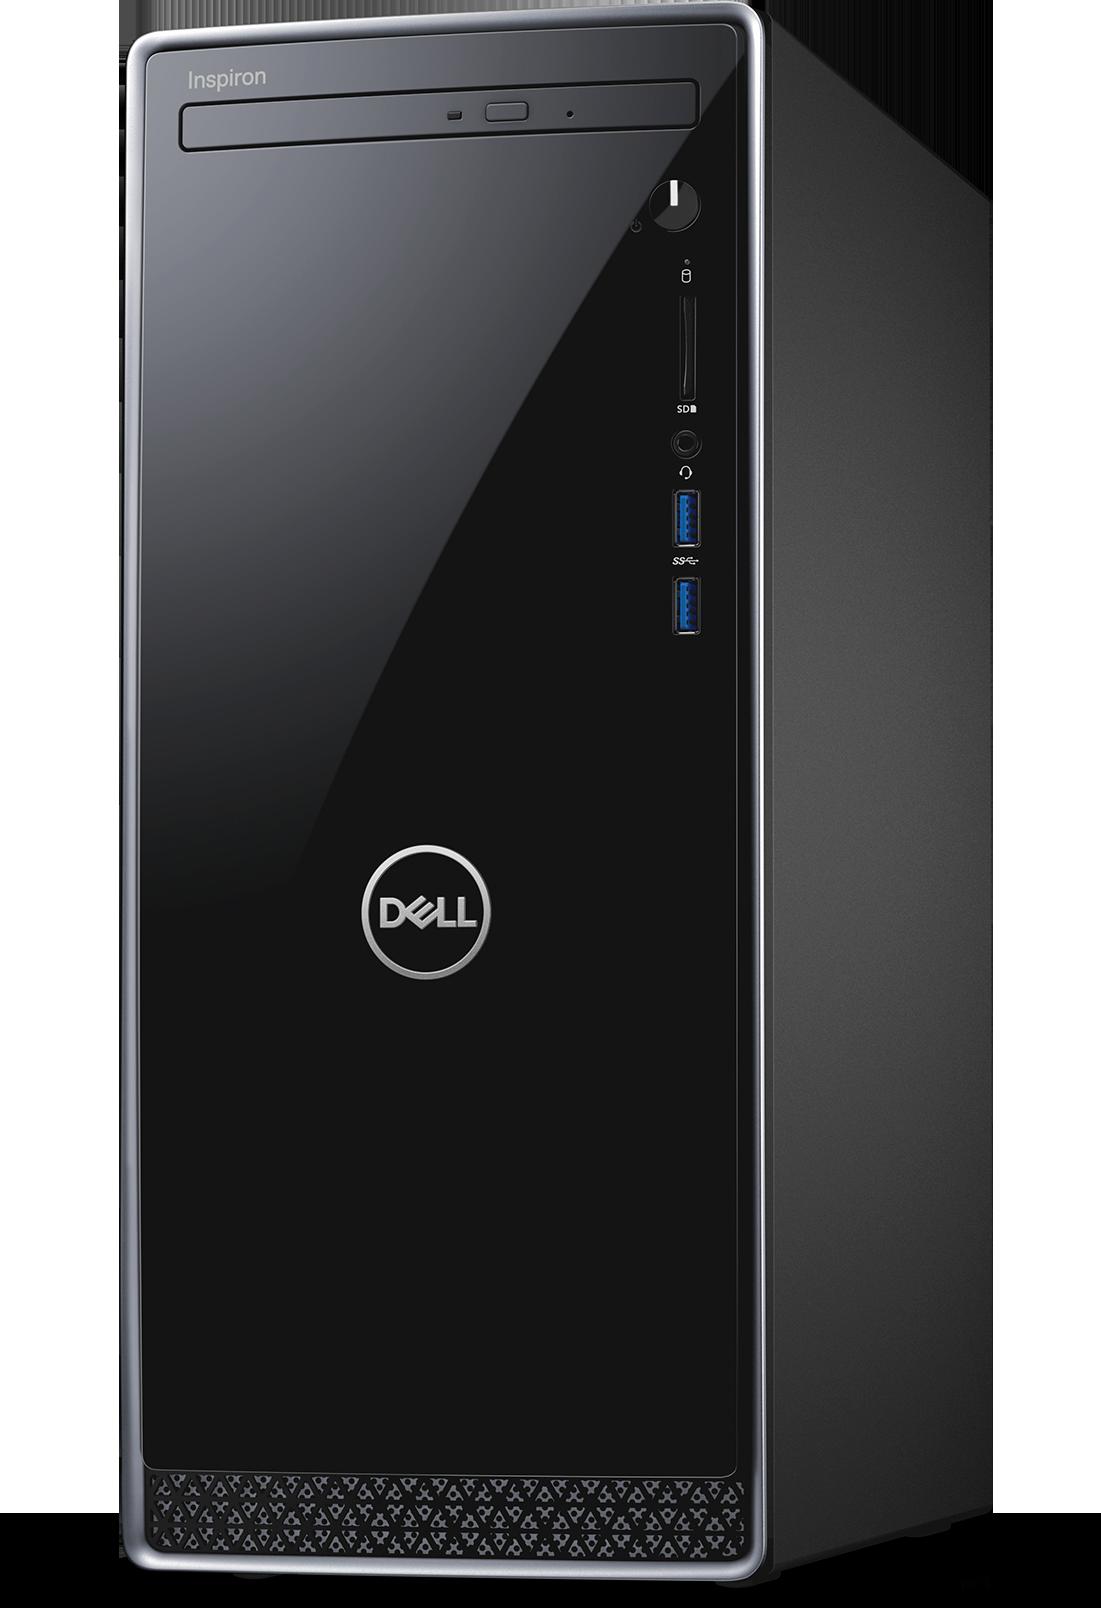 Dell Inspiron 3670 i3670-5750BLK-PUS Desktop